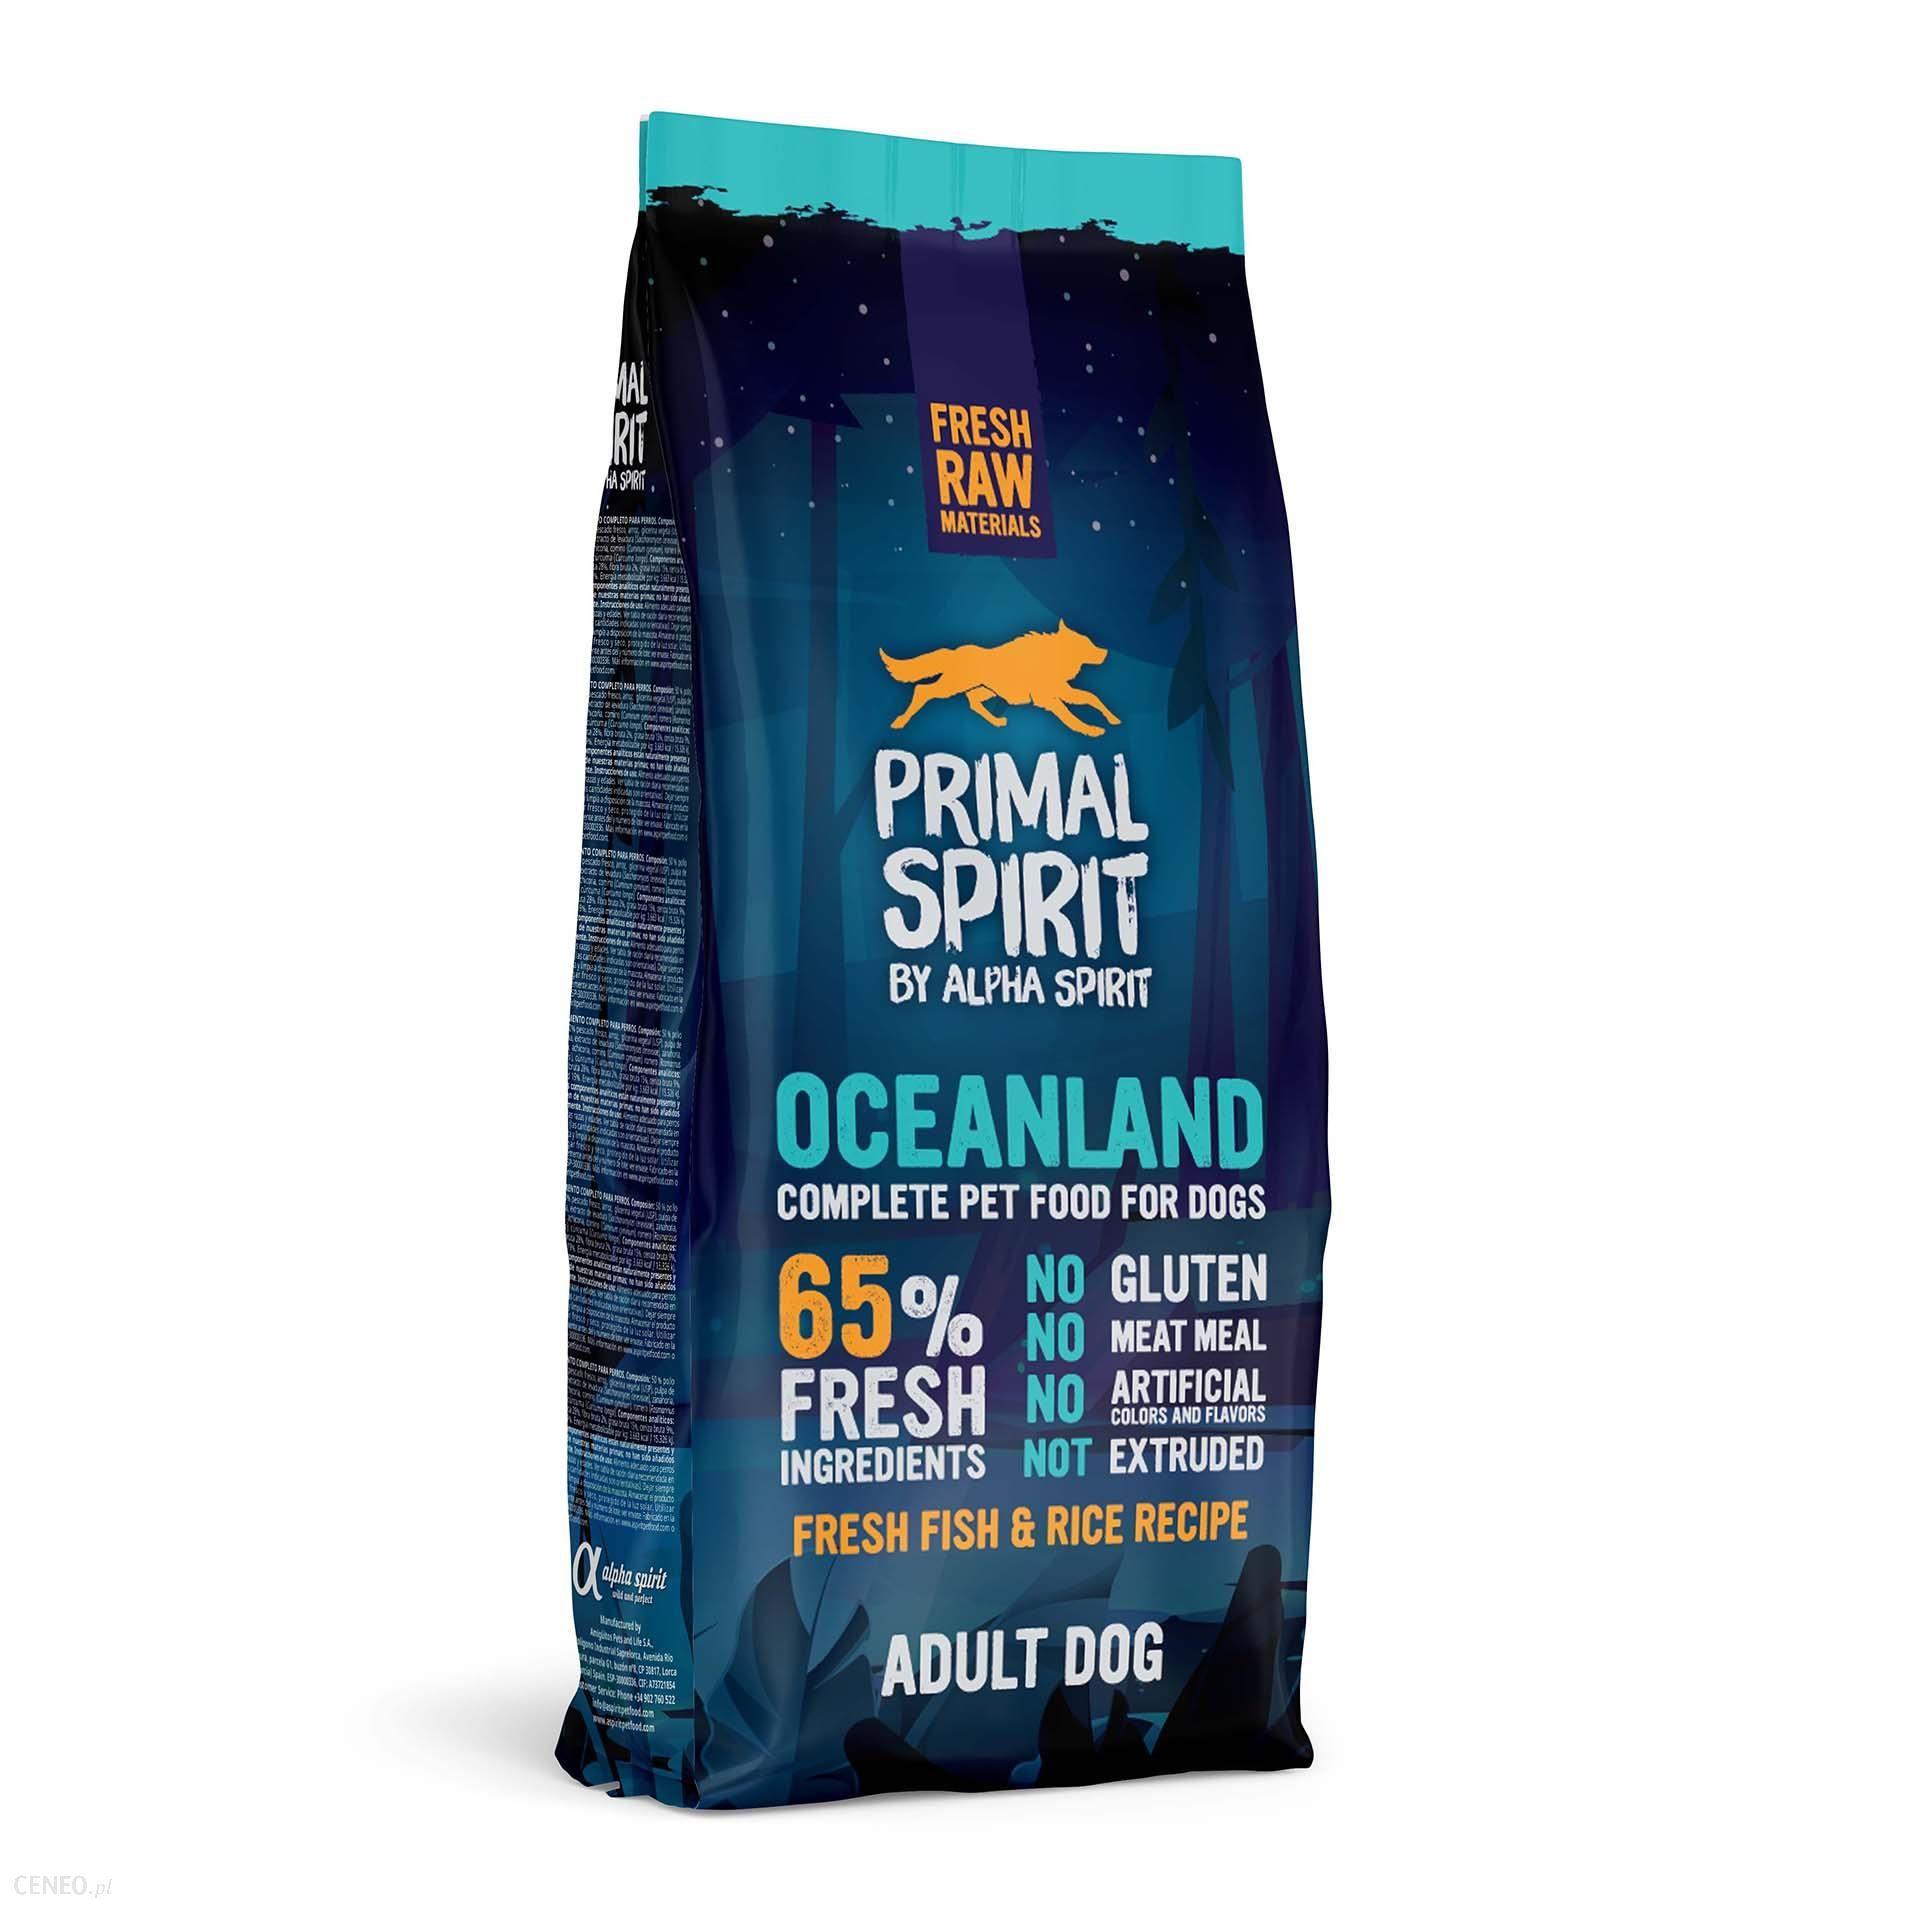 Primal Spirit 65% Oceanland 12Kg